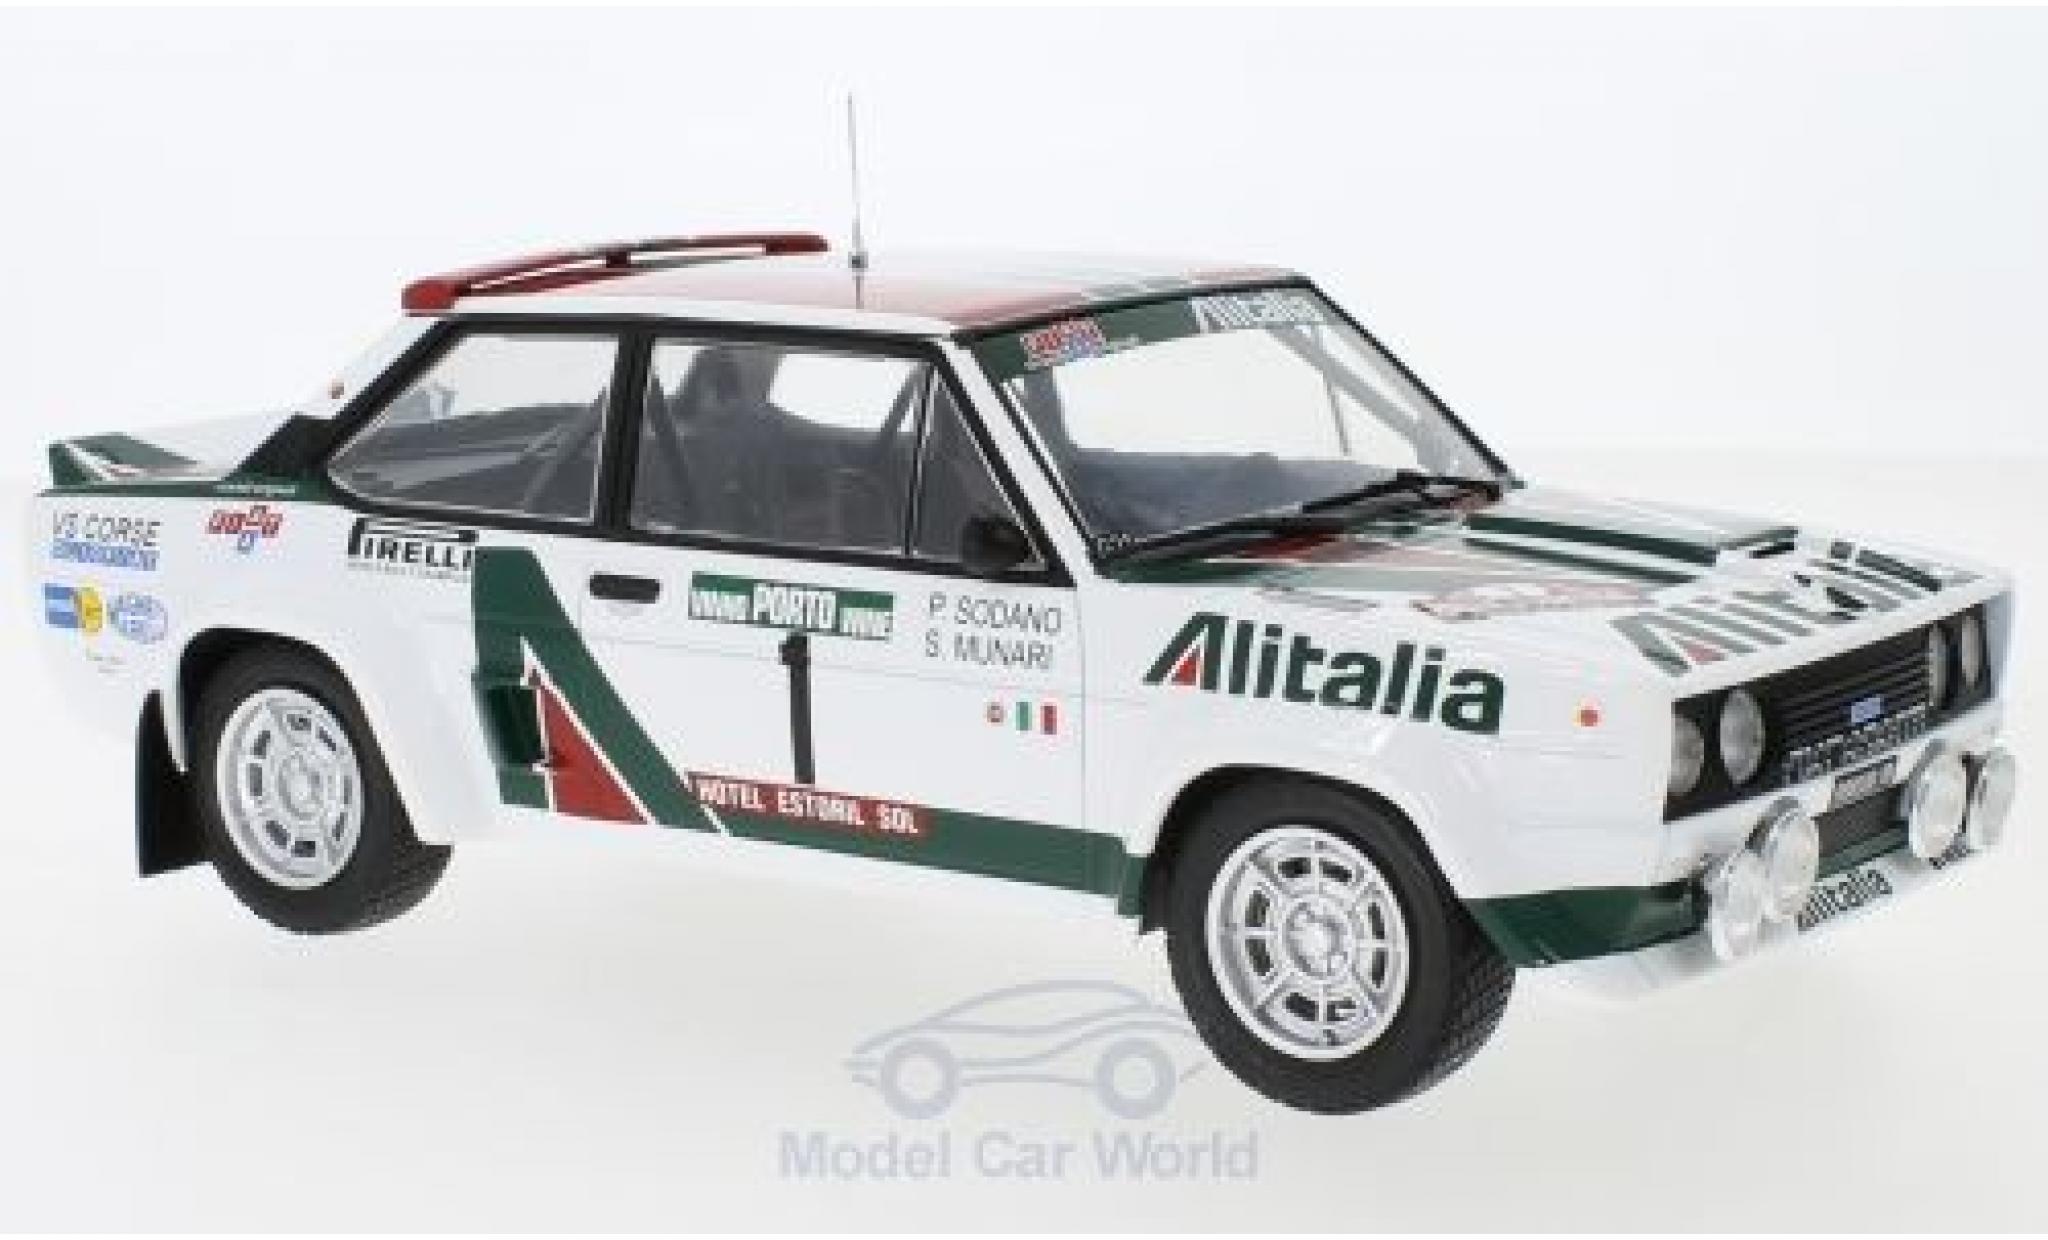 Fiat 131 1/18 IXO Abarth No.1 Alitalia Rallye WM Rallye Portugal 1978 S.Munari/P.Sodano